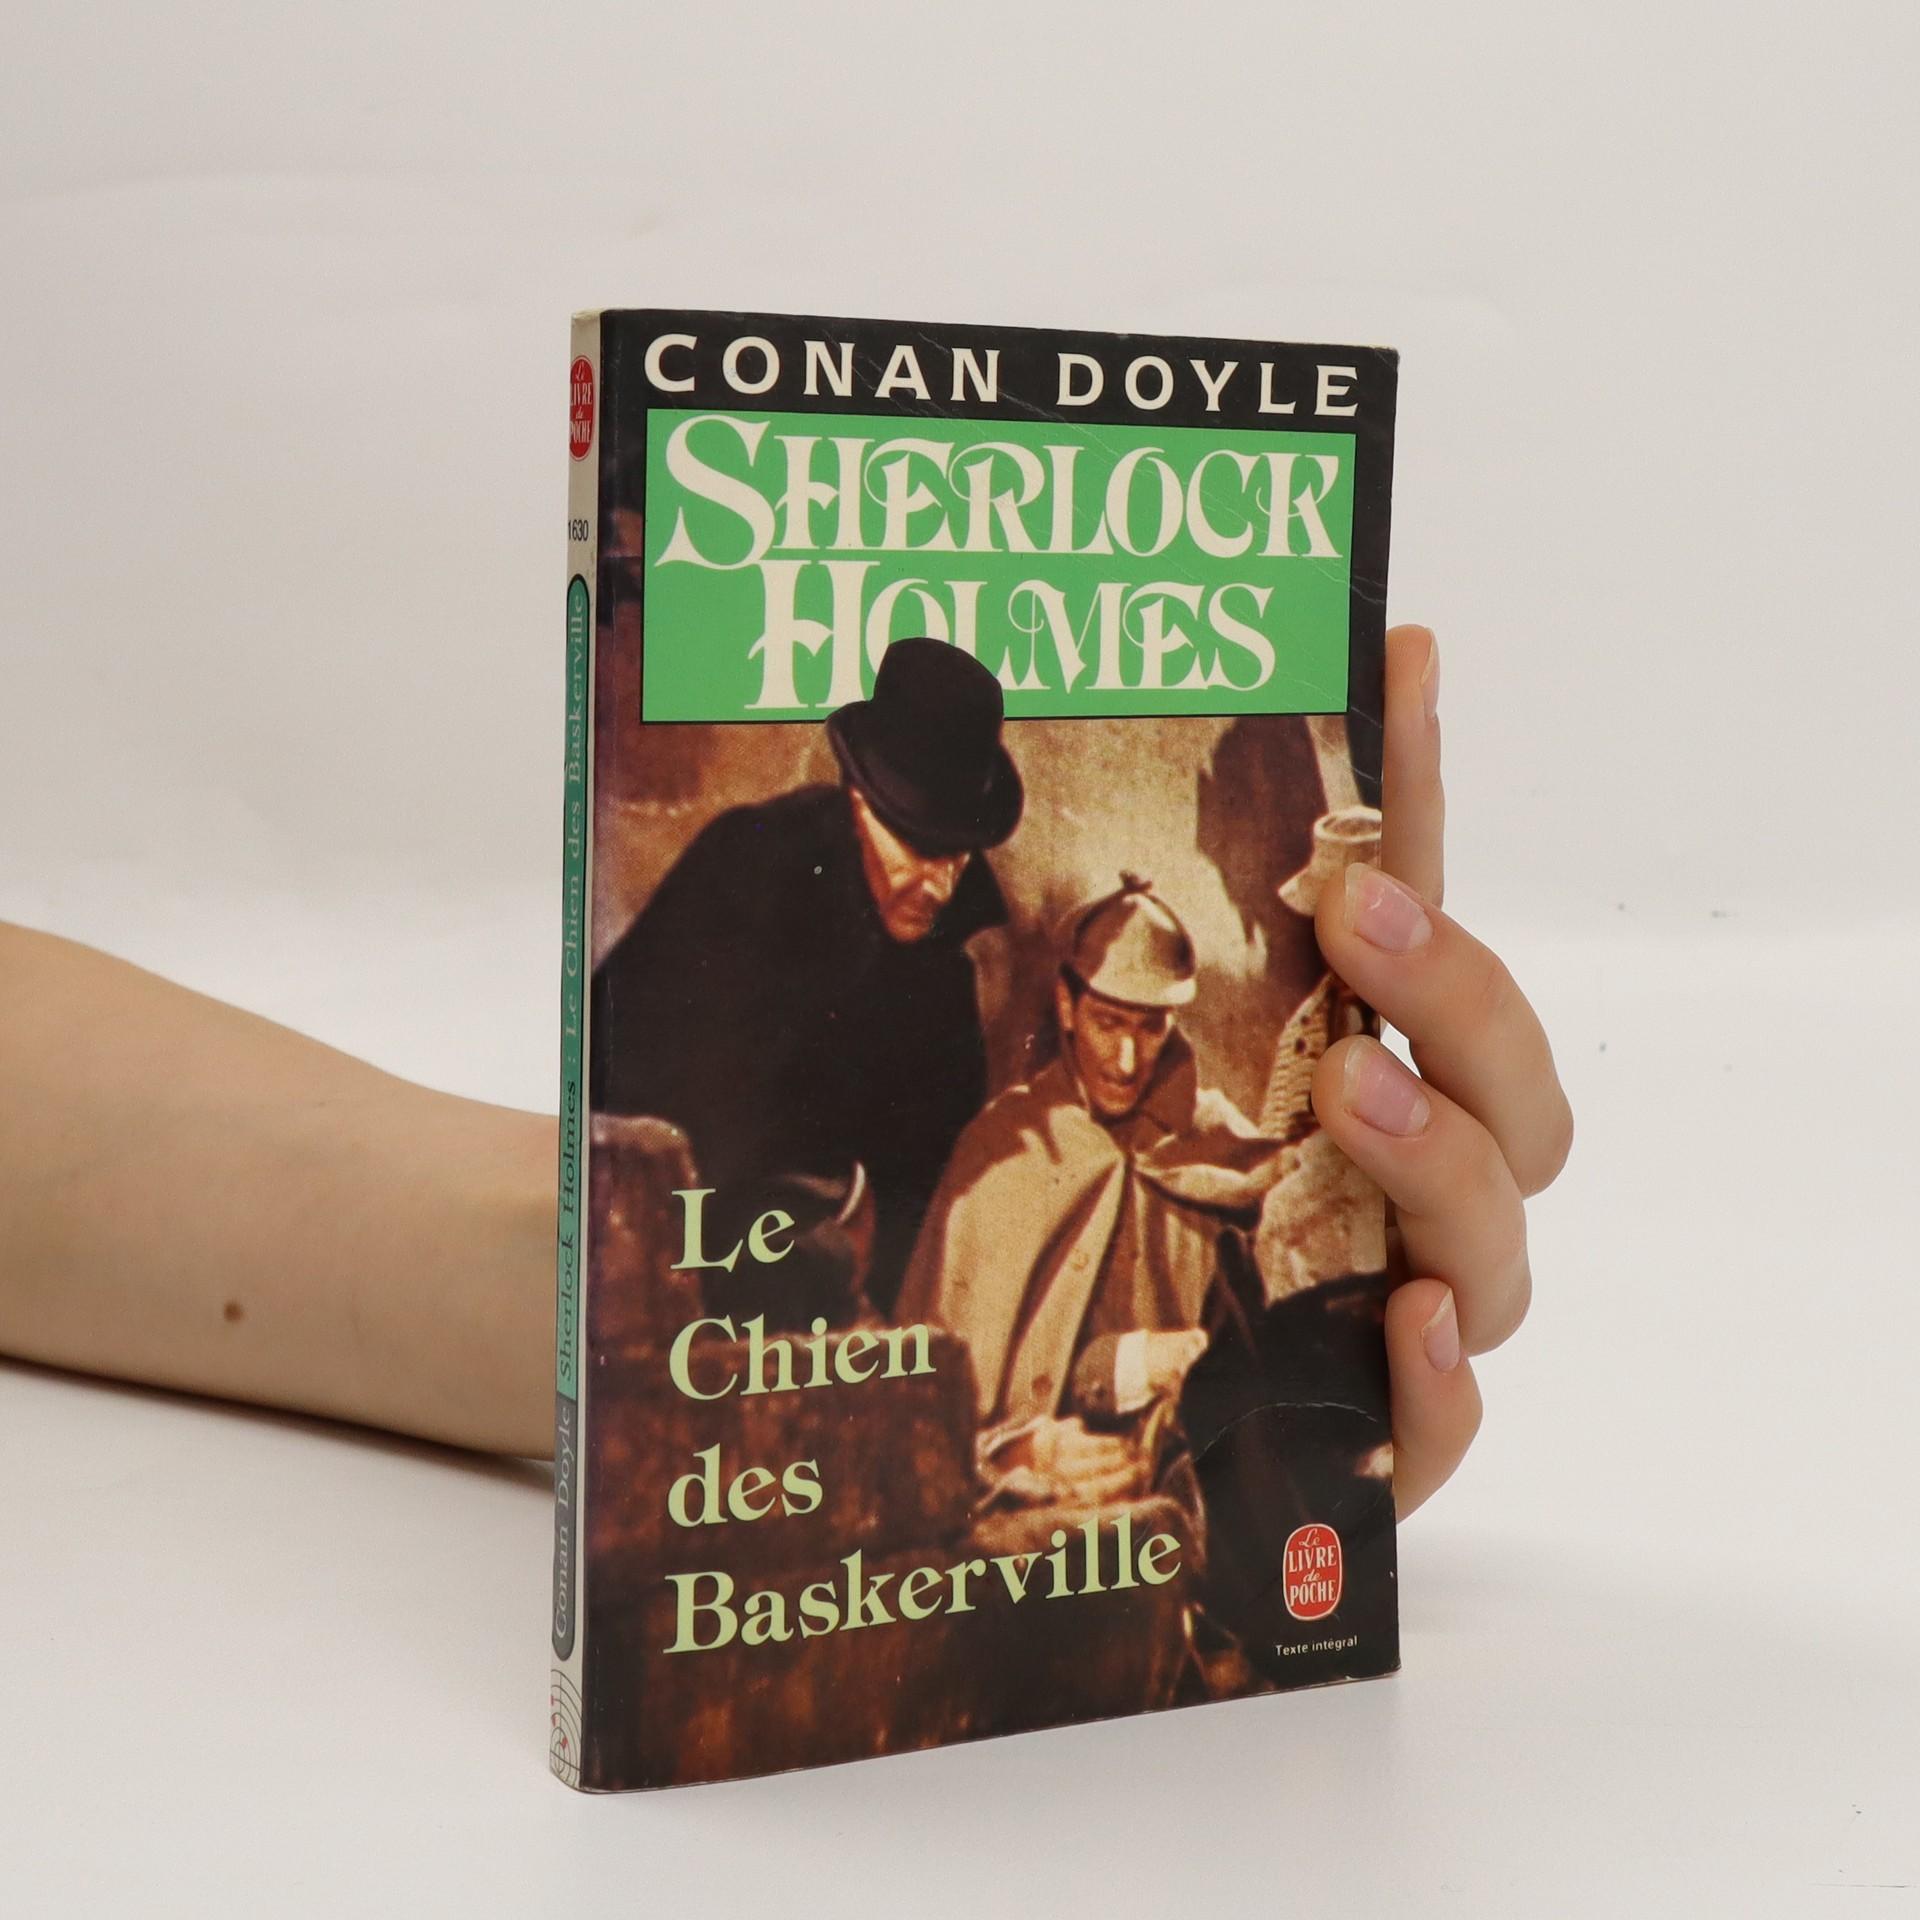 antikvární kniha Sherlock Holmes. Le Chien des Baskerville, neuveden